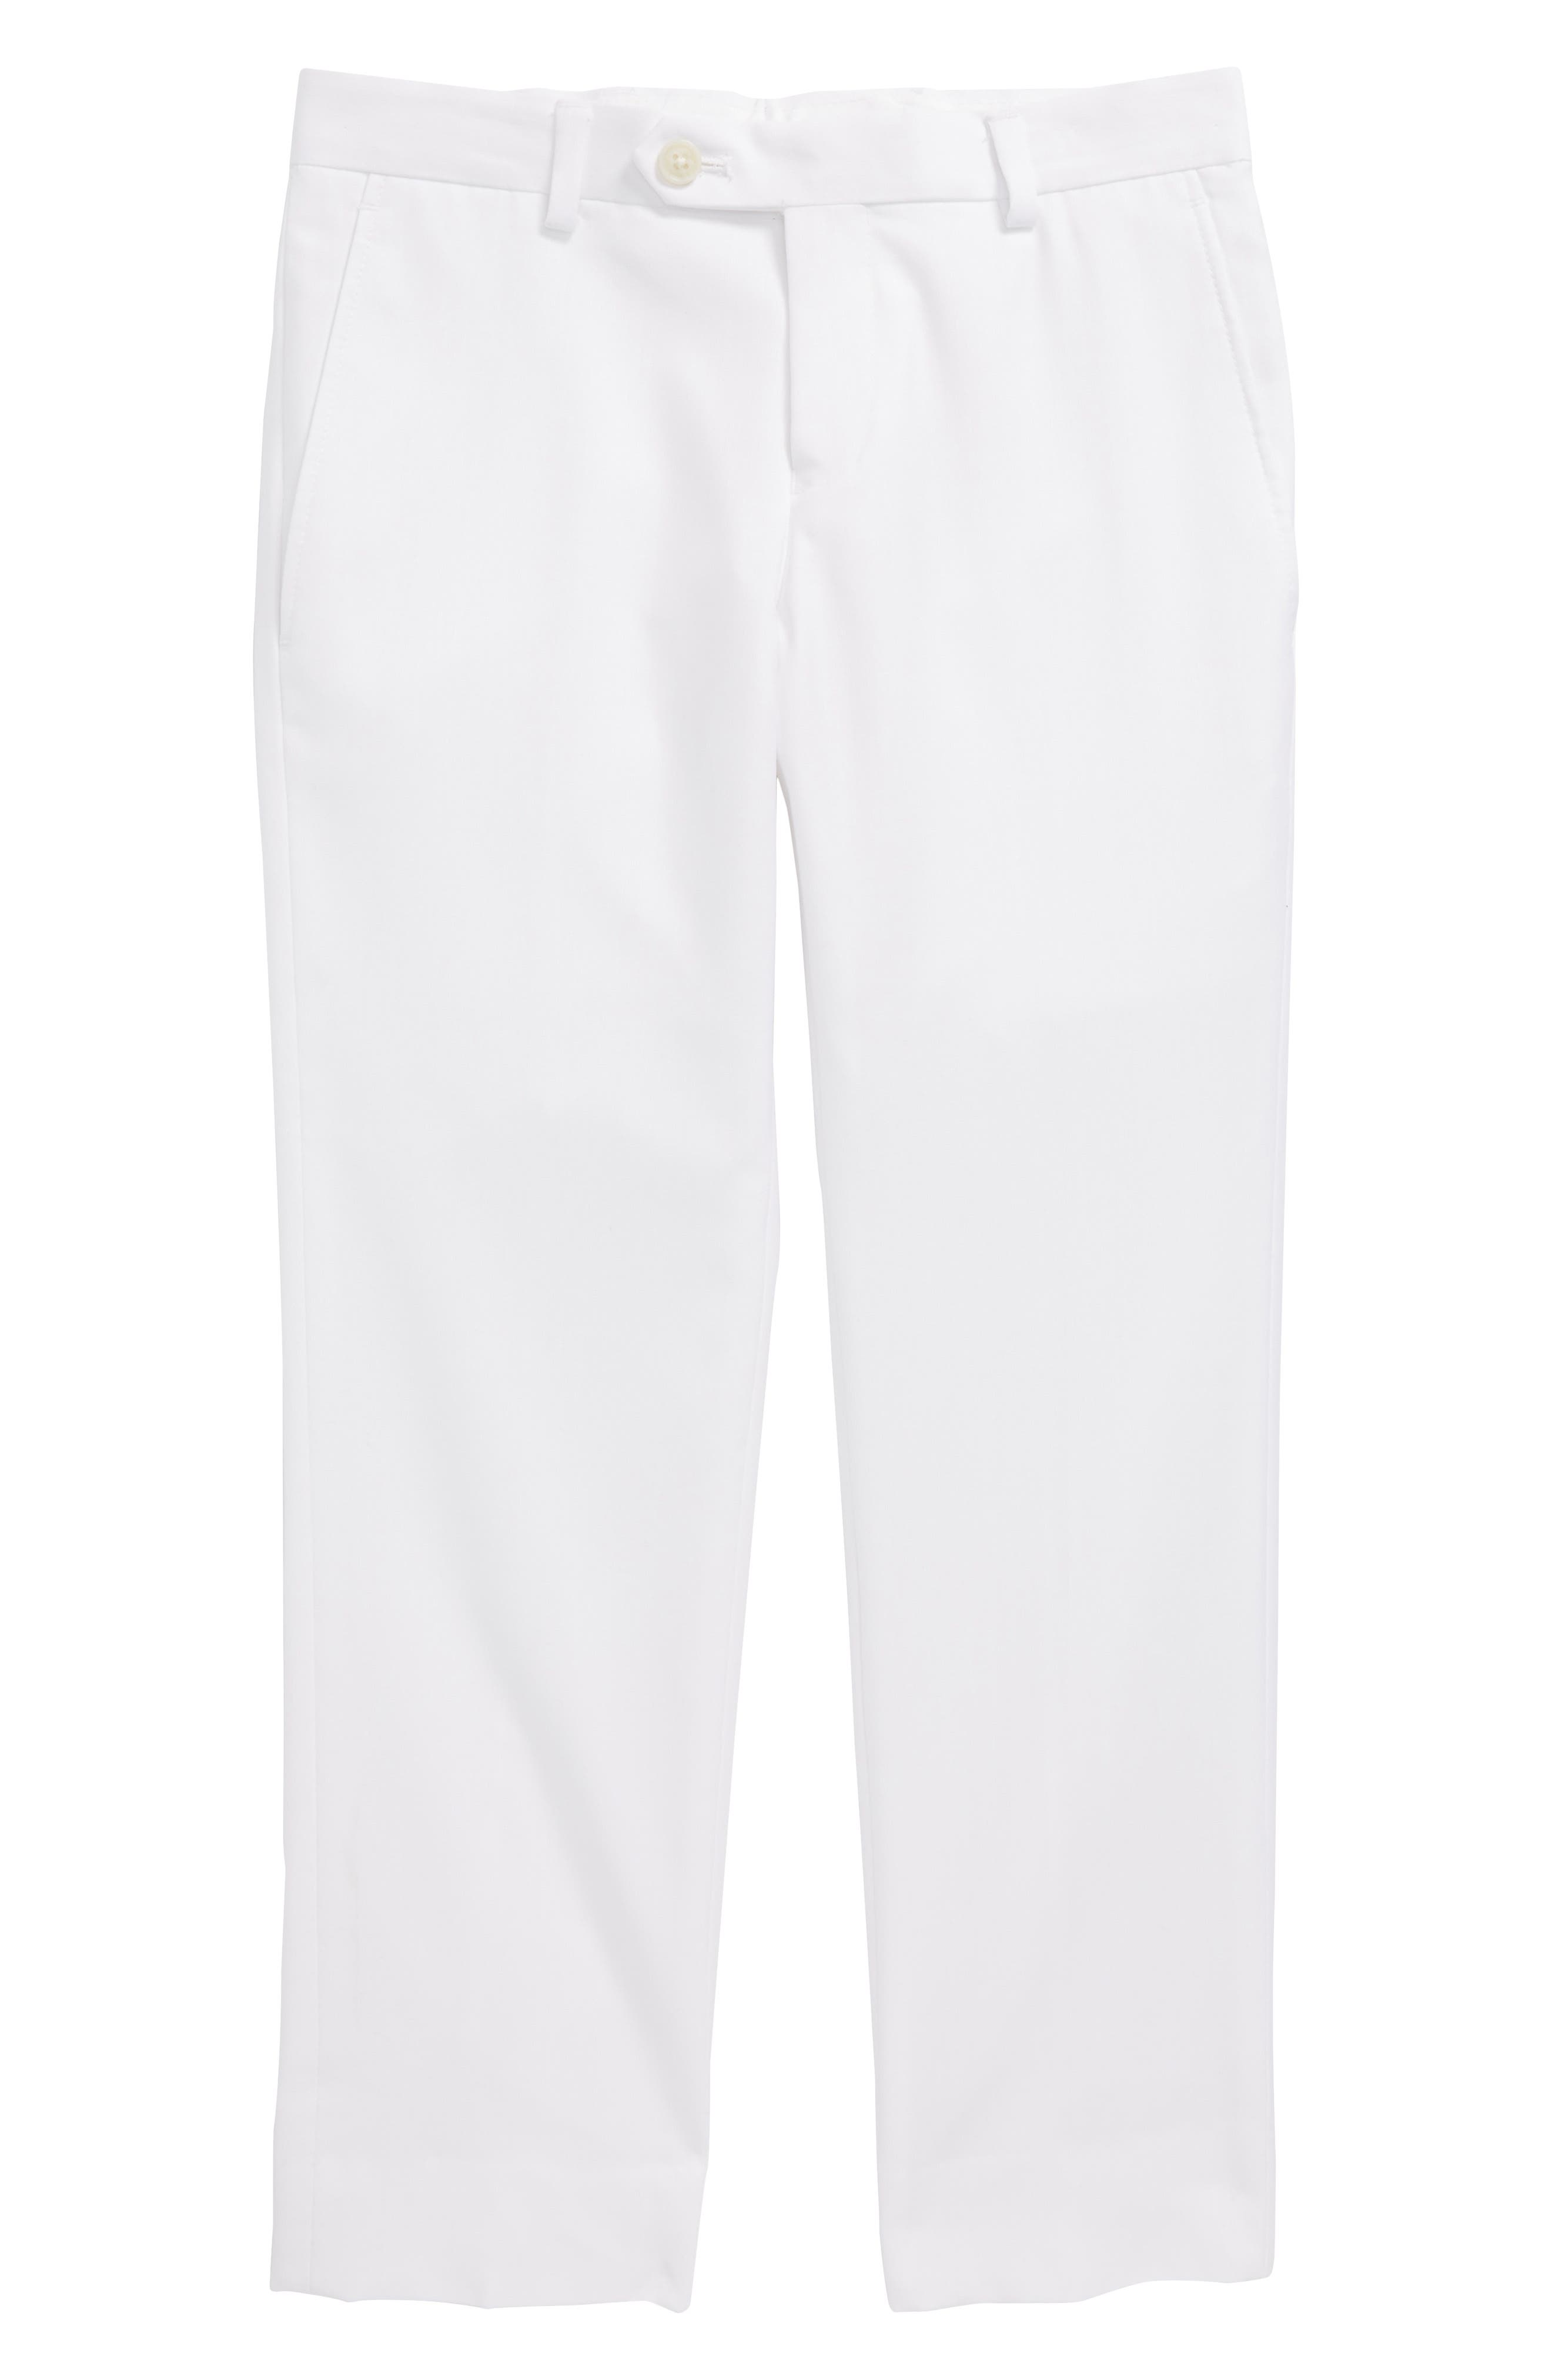 Flat Front Pants,                             Main thumbnail 1, color,                             White